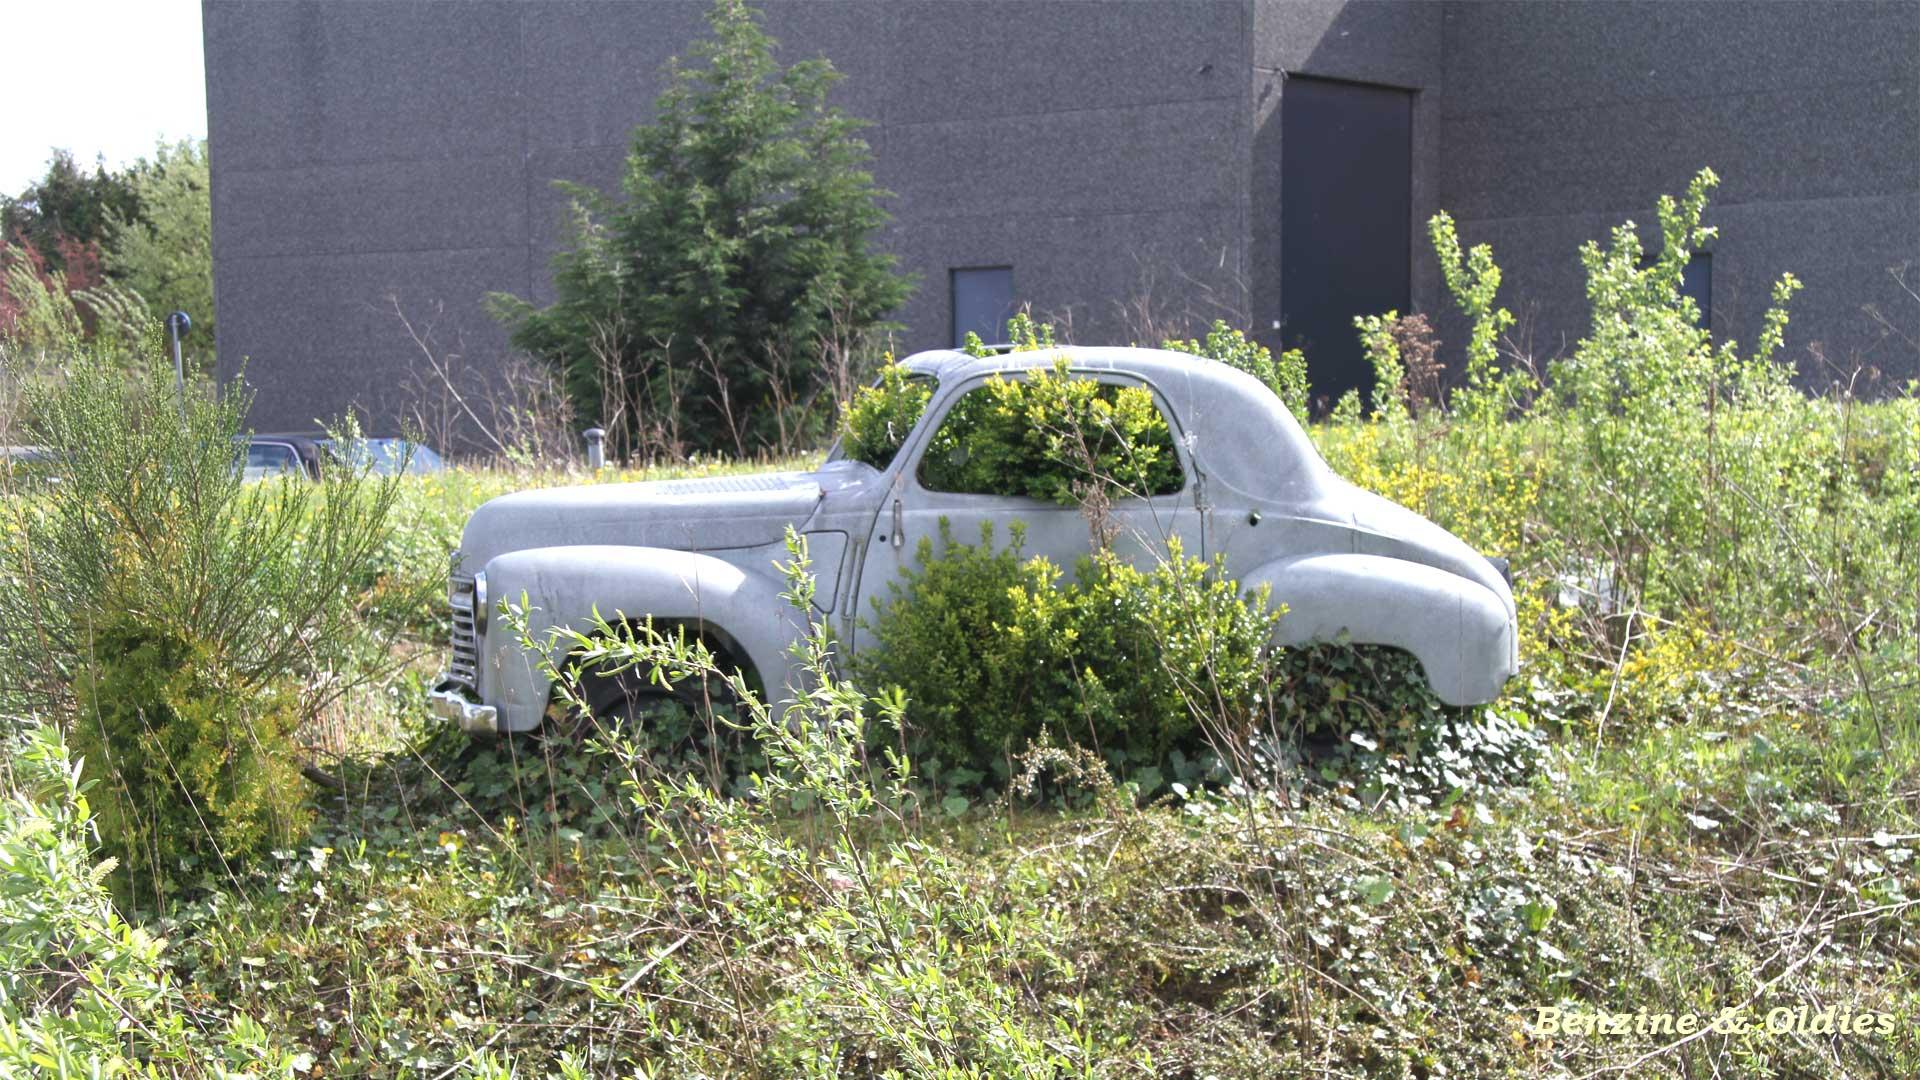 une Simca 6 carrosserie aluminium oubliée dans la nature - Simca6 151390simca6street13w19201080